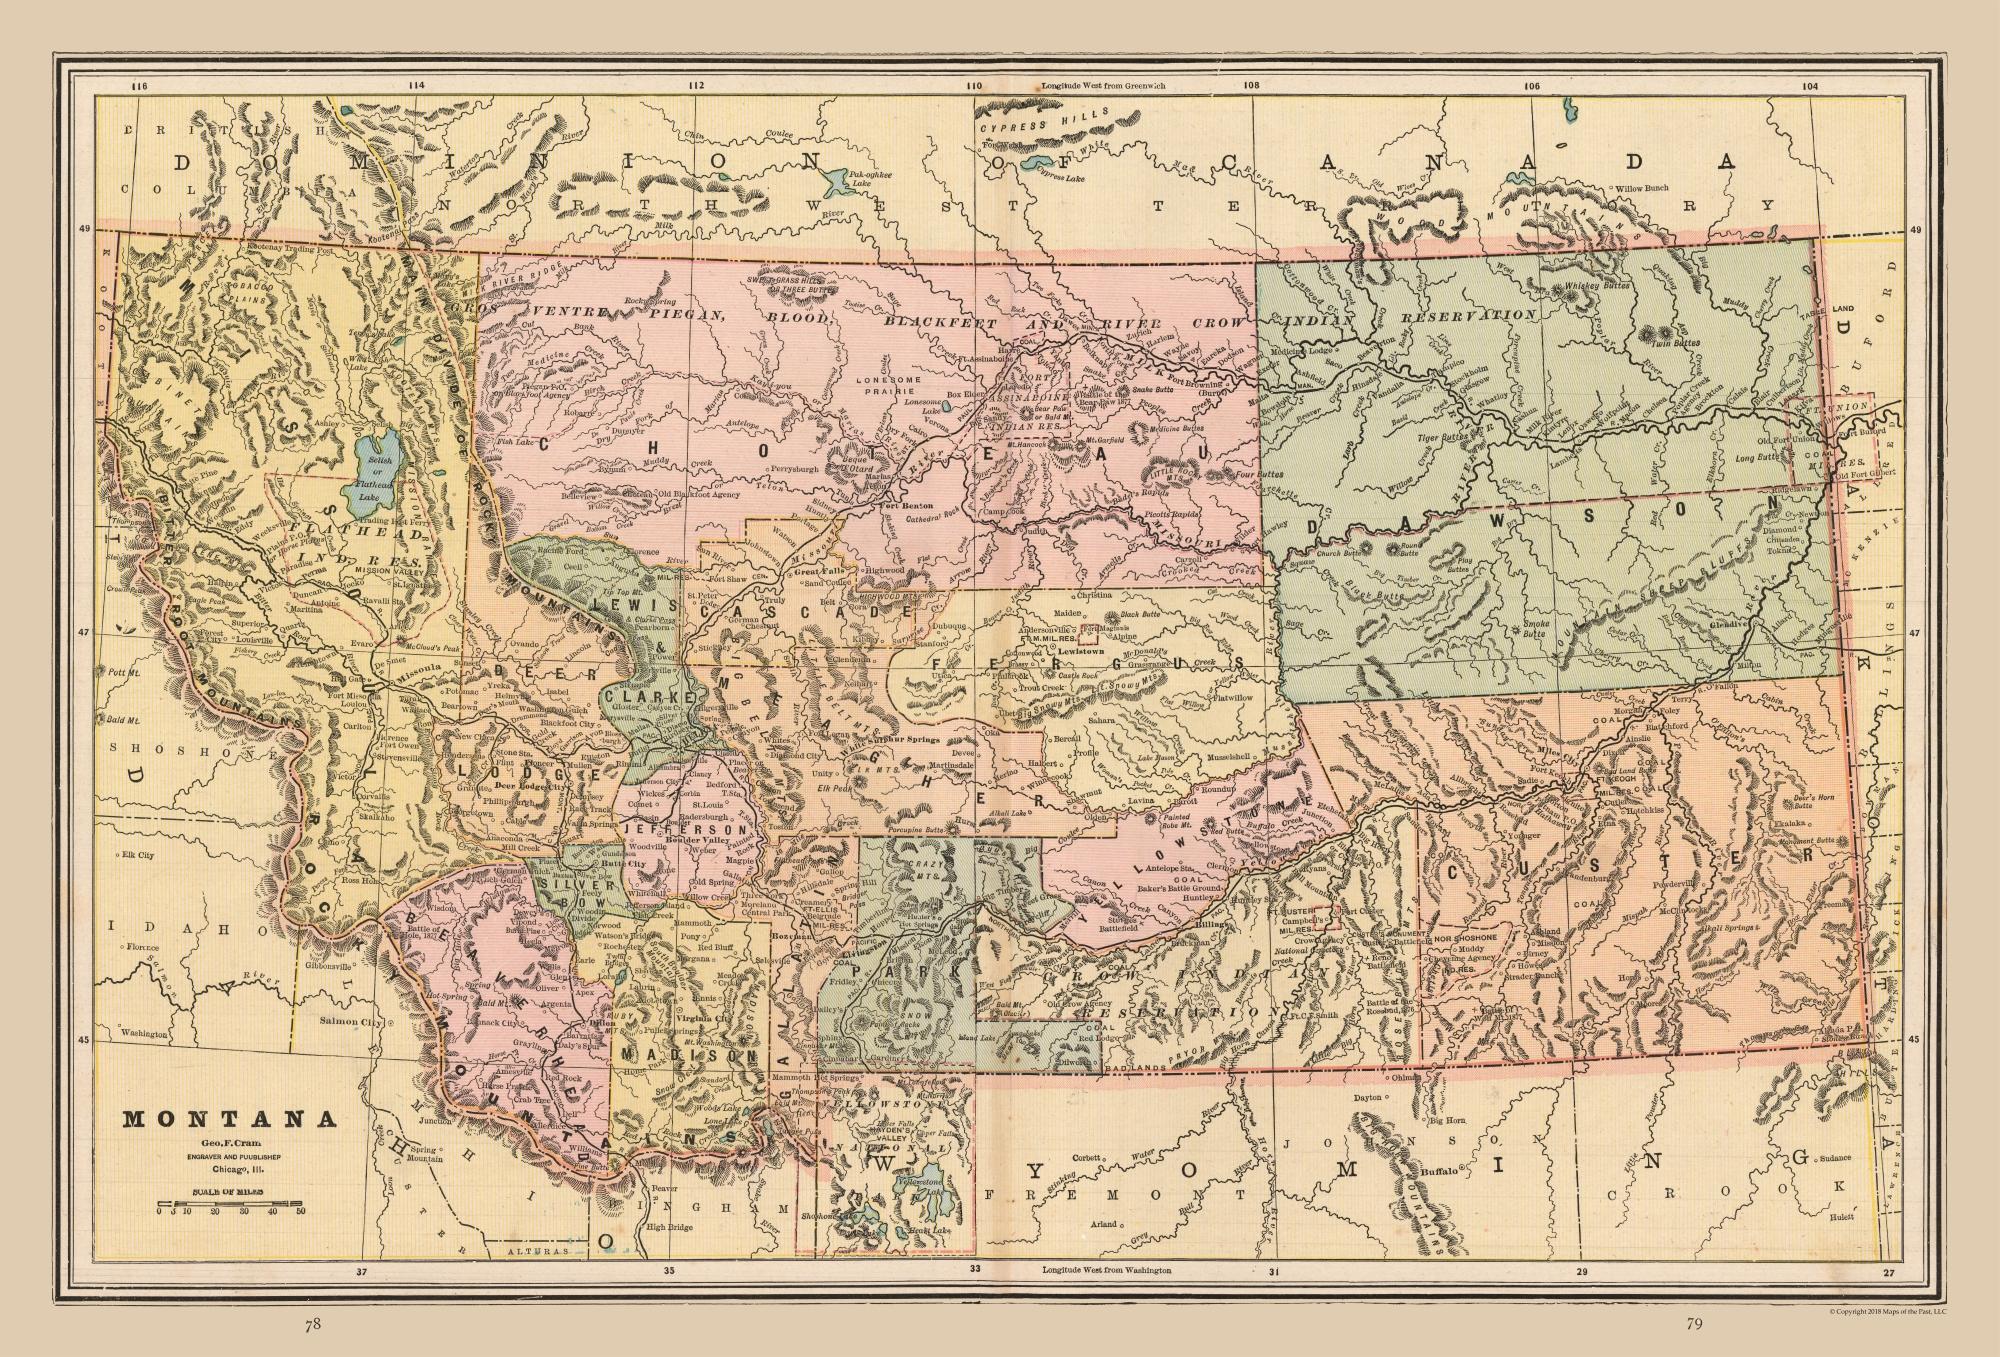 Old State Maps - Montana - Cram\'s Atlas 1888 - 33.90 x 23